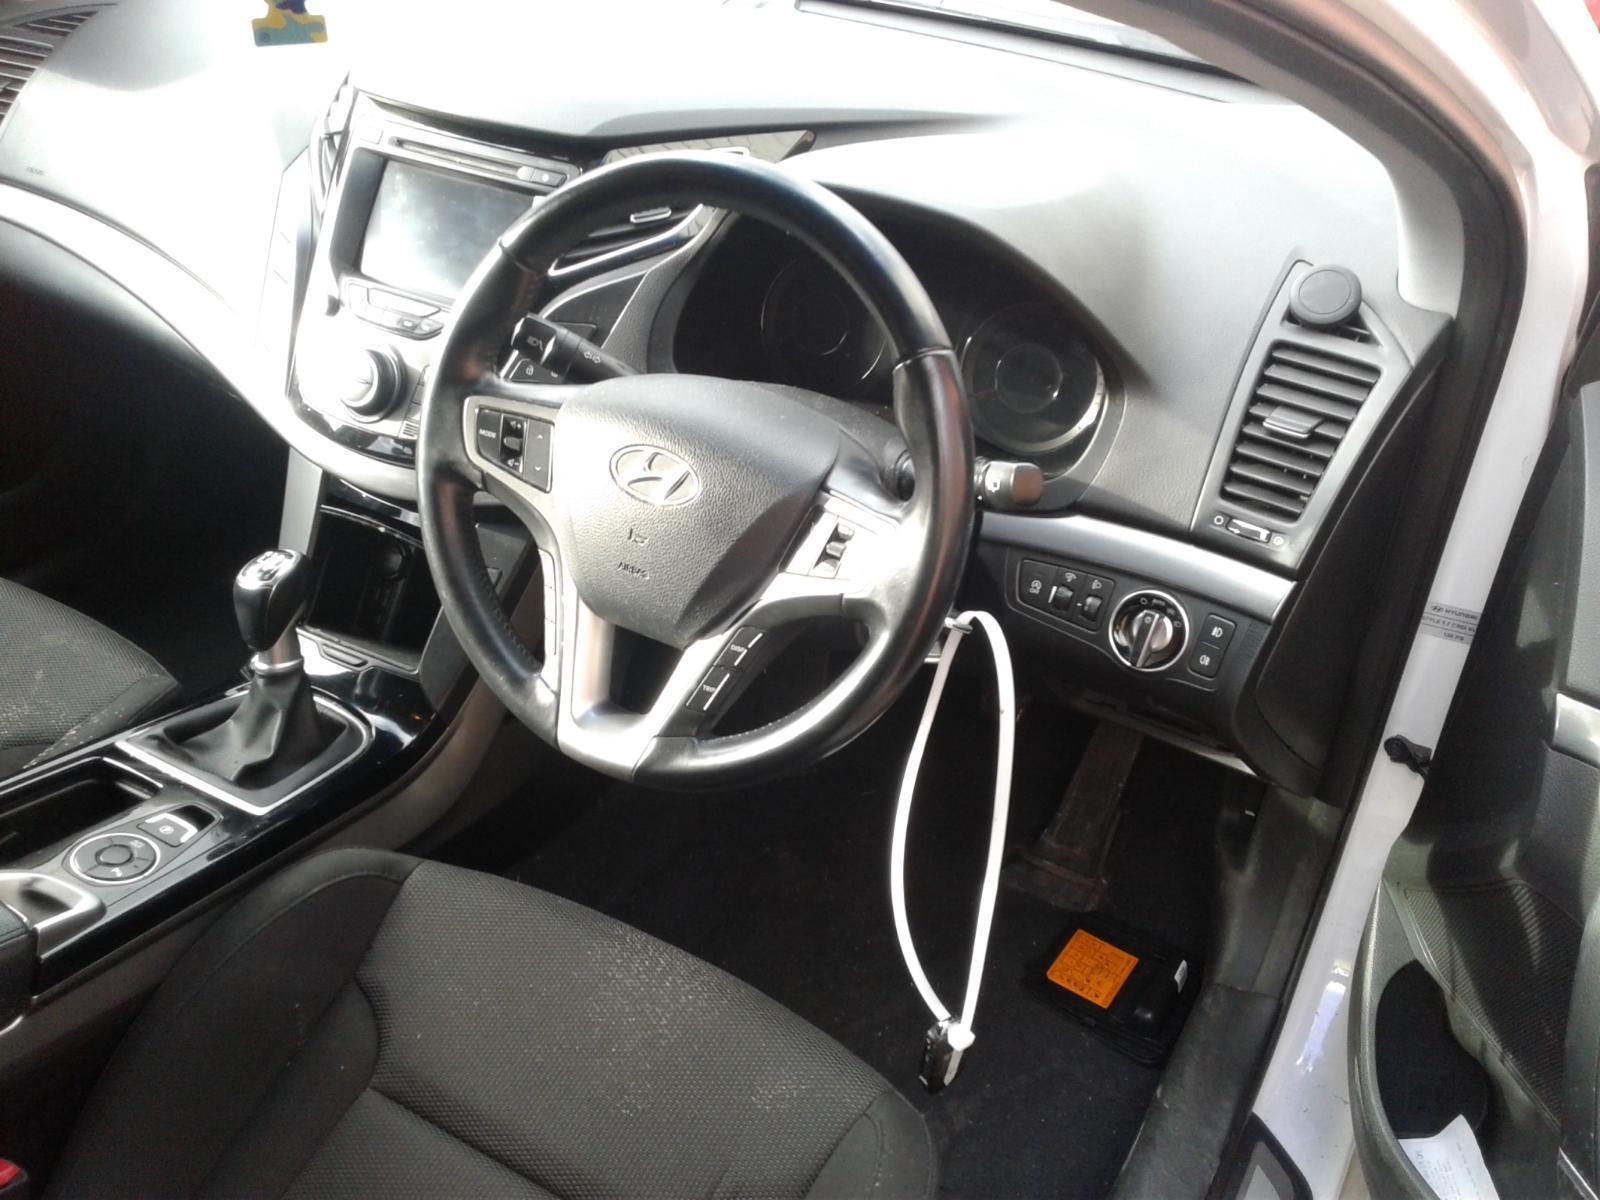 2014 Hyundai I40 CRDI STYLE BLUE DRIVE Image